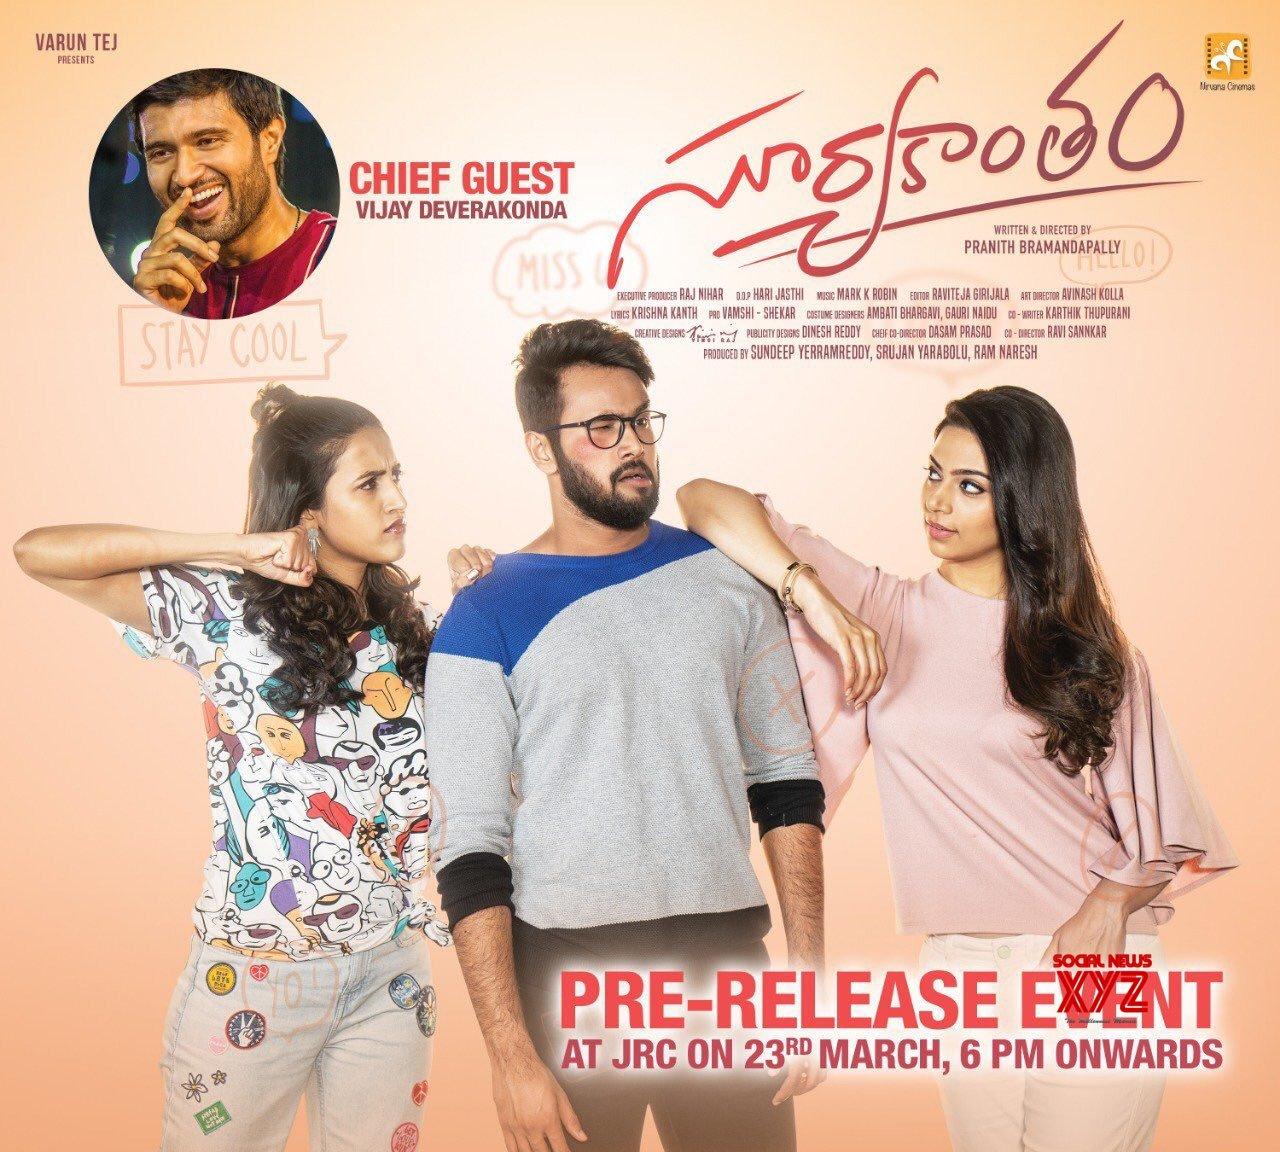 Suryakantam Pre Release Event Will Be Graced By Vijay Deverakonda On March 23rd